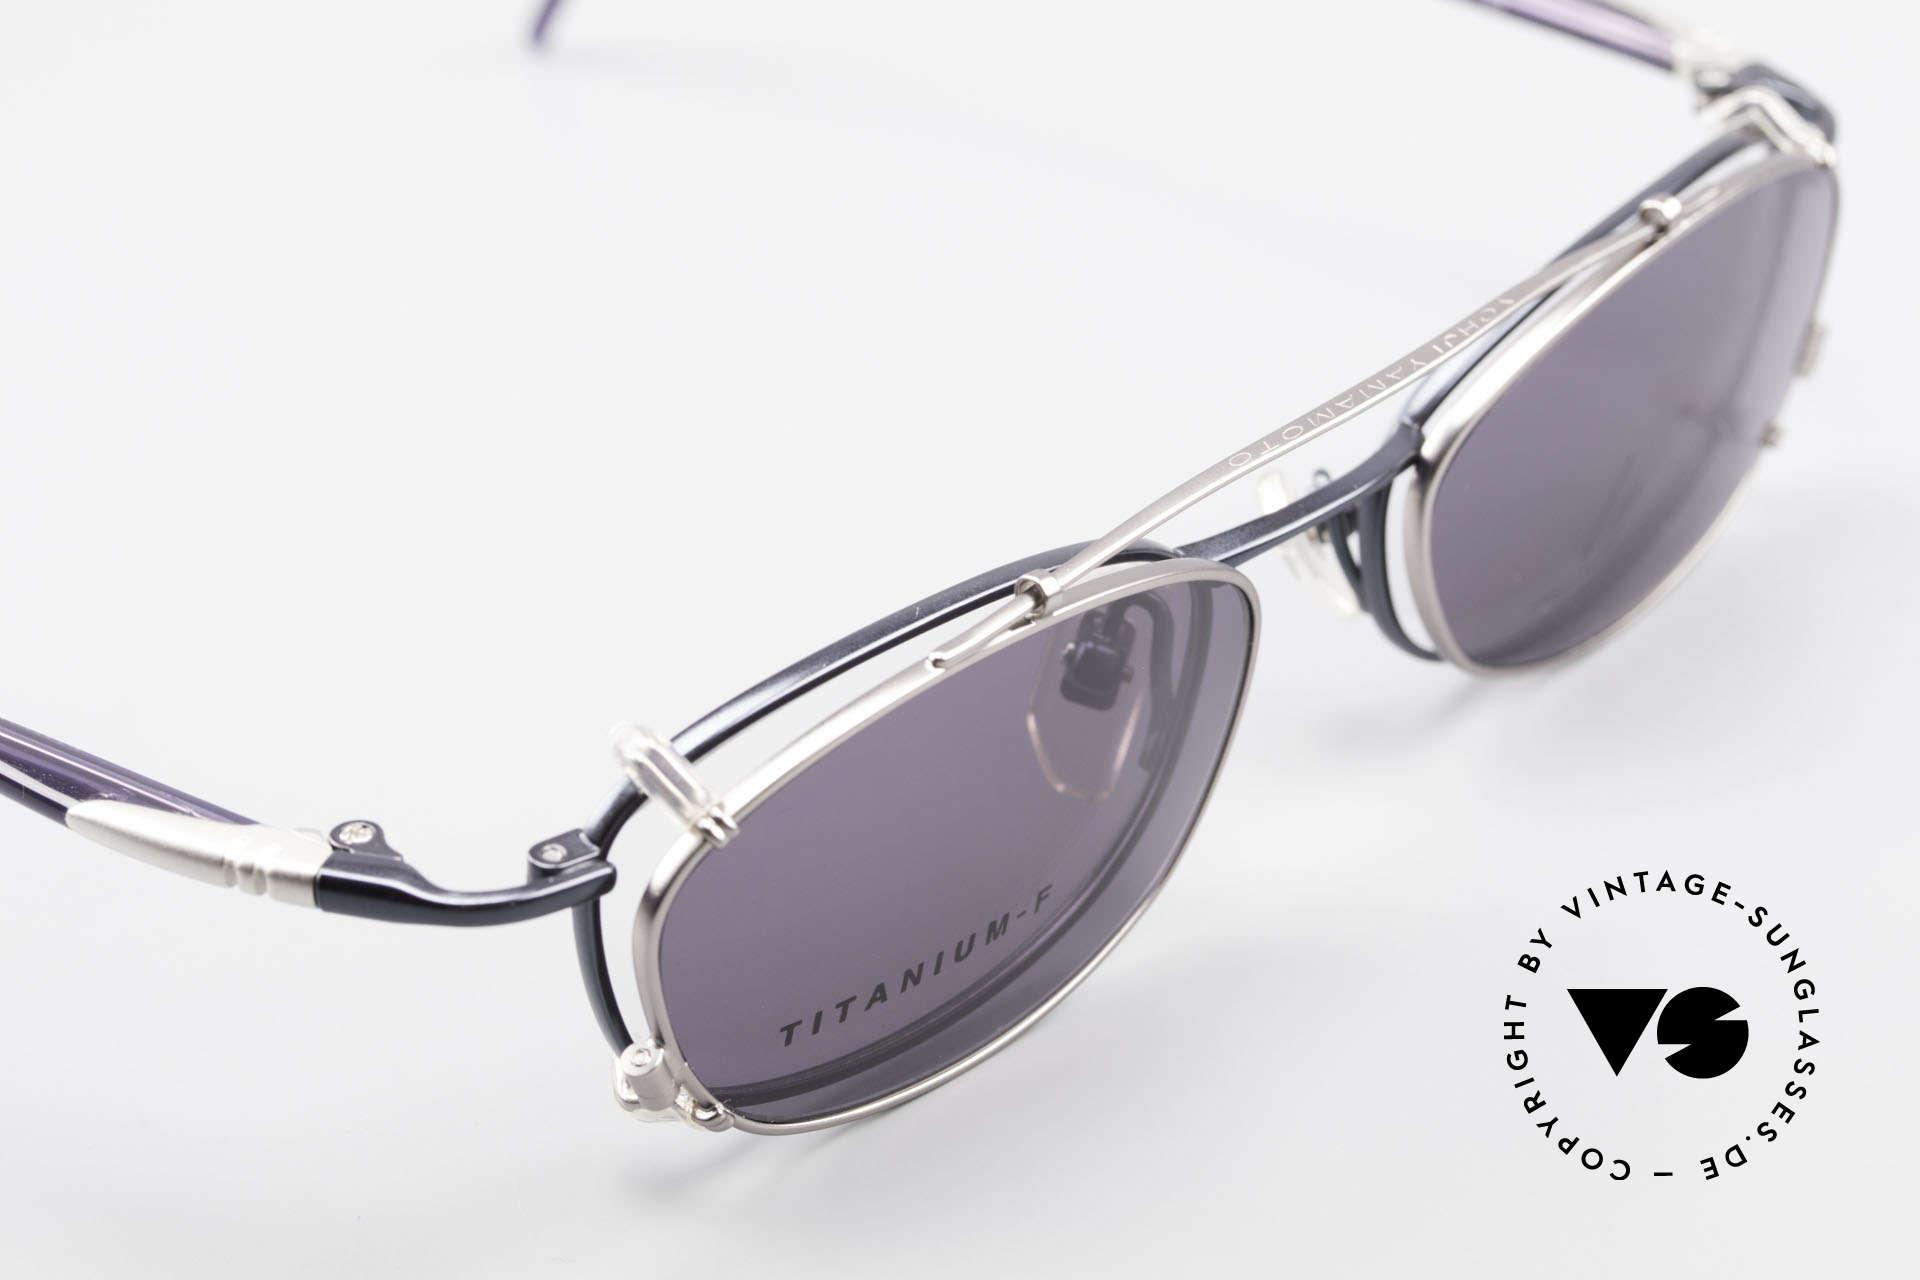 Yohji Yamamoto 51-0013 Clip On Titanium Frame Blue, never worn: like all our quality designer (sun)glasses, Made for Men and Women